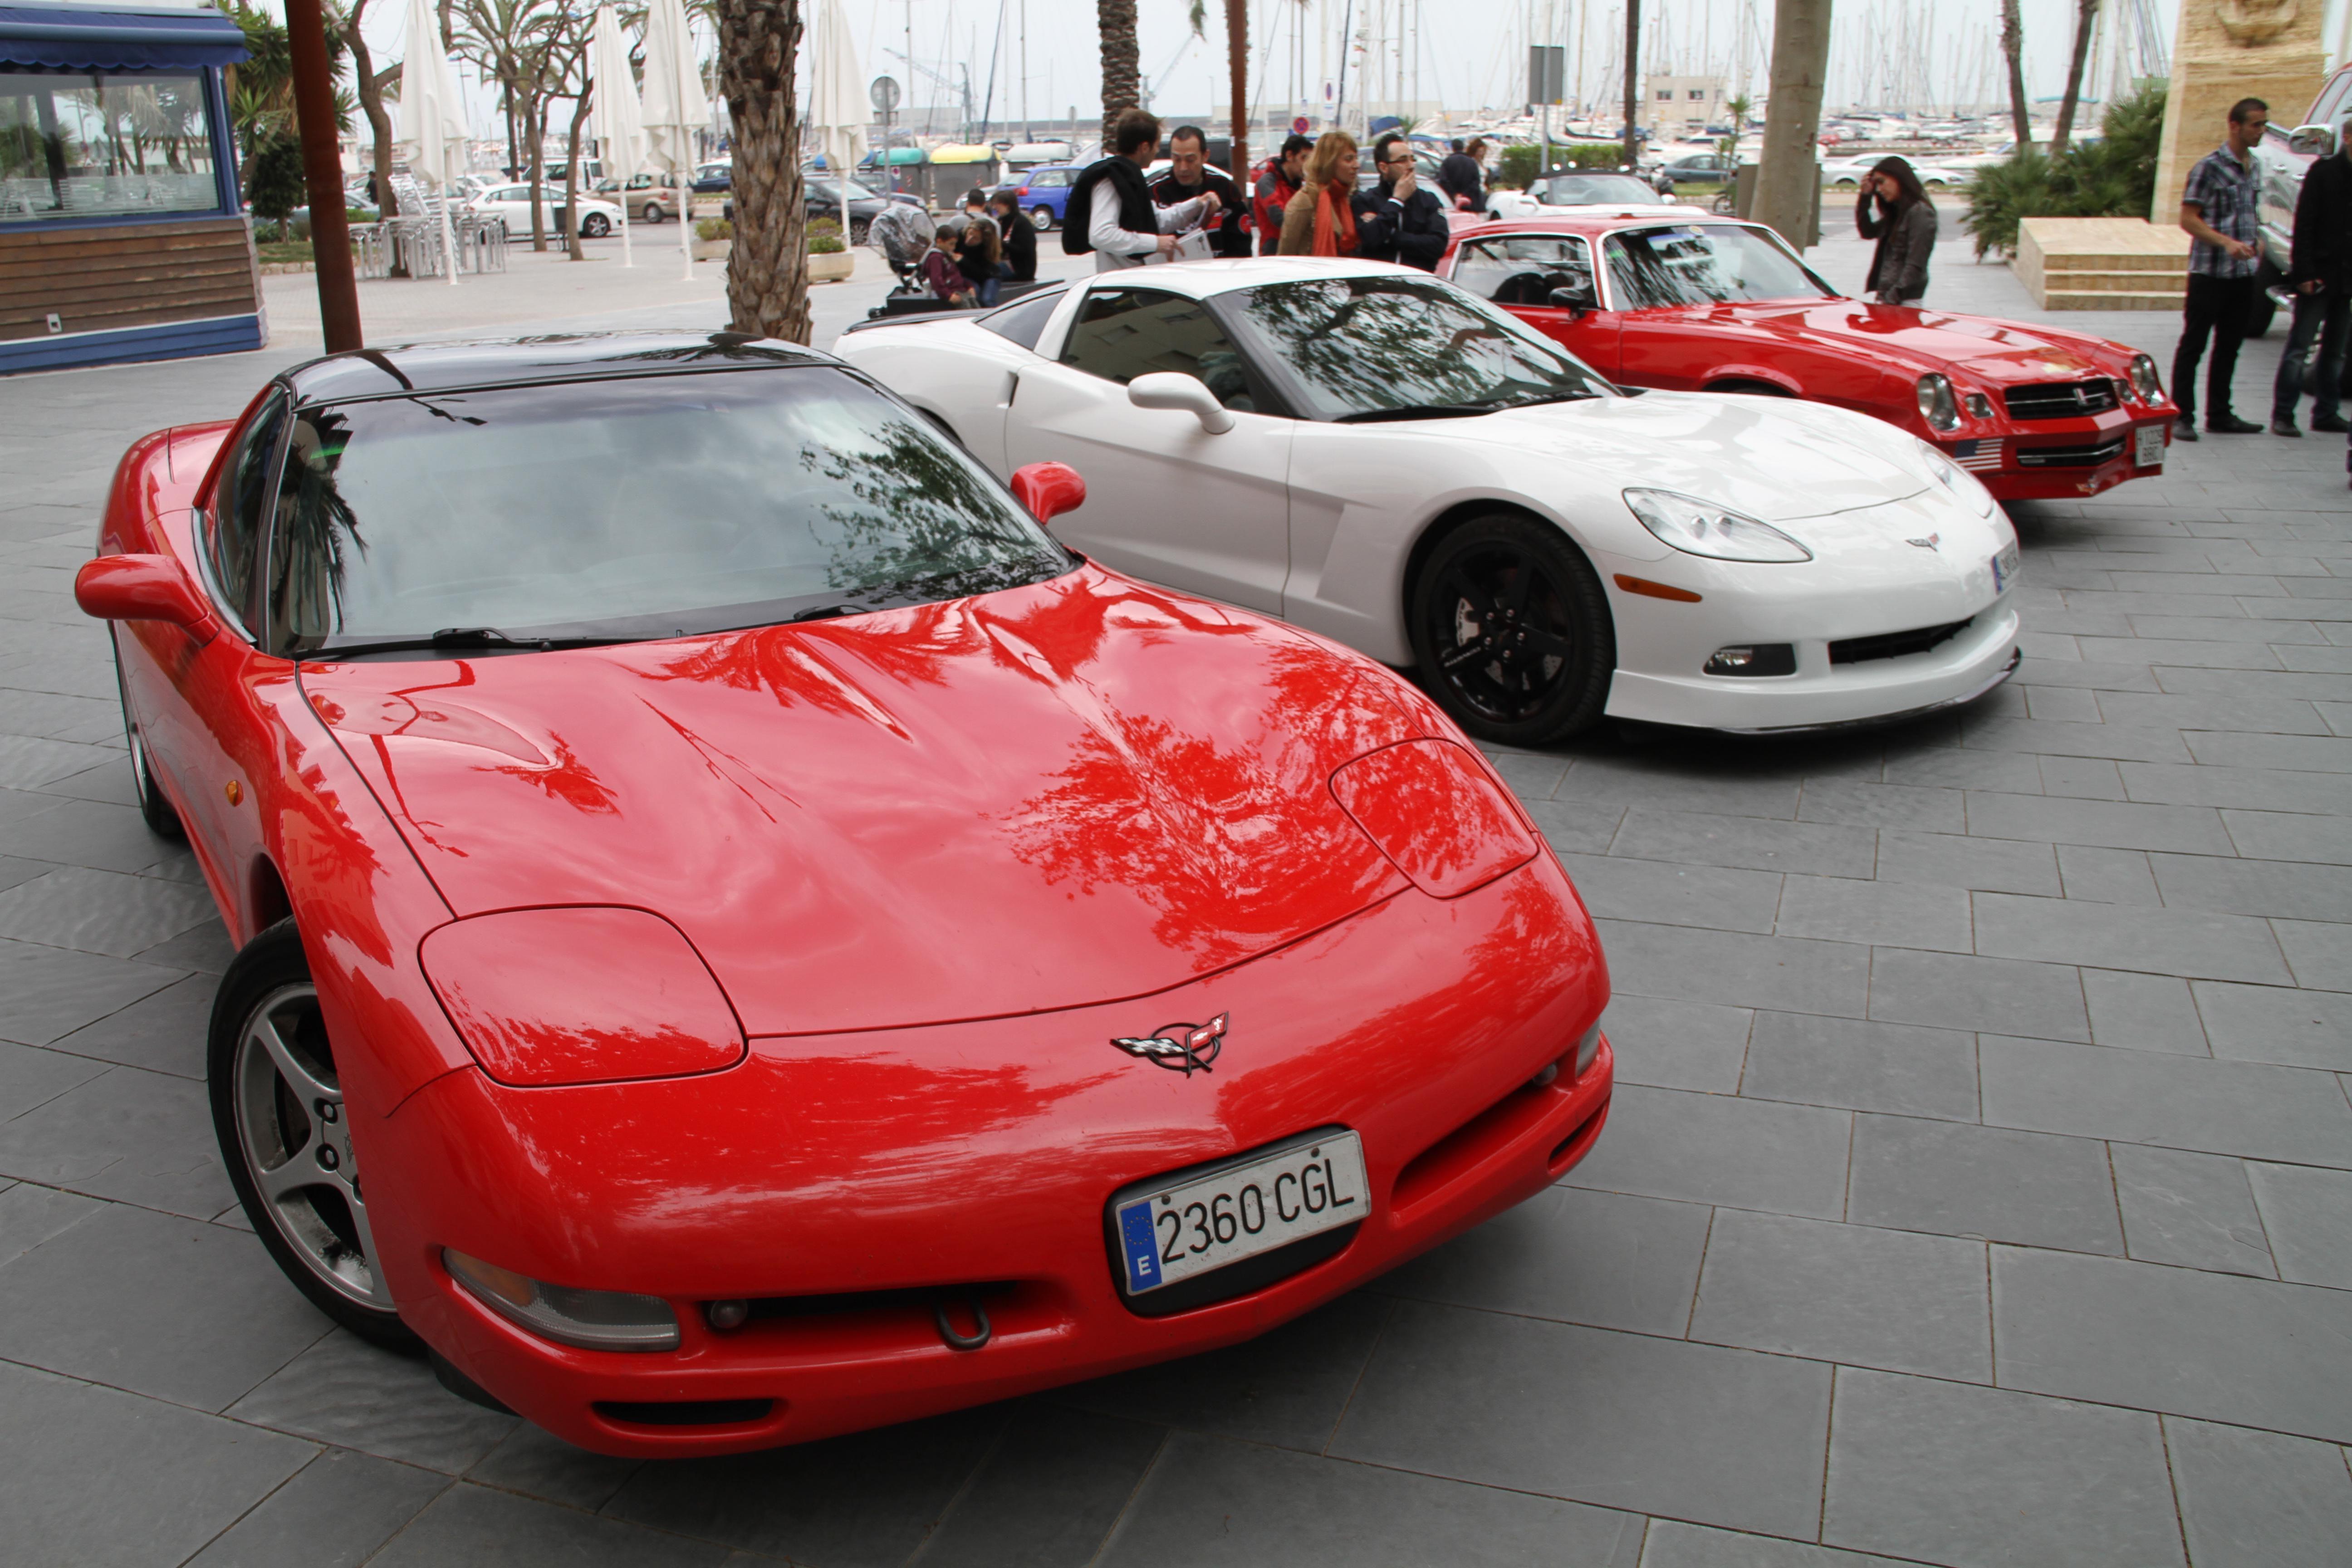 Corvette History Since 1953